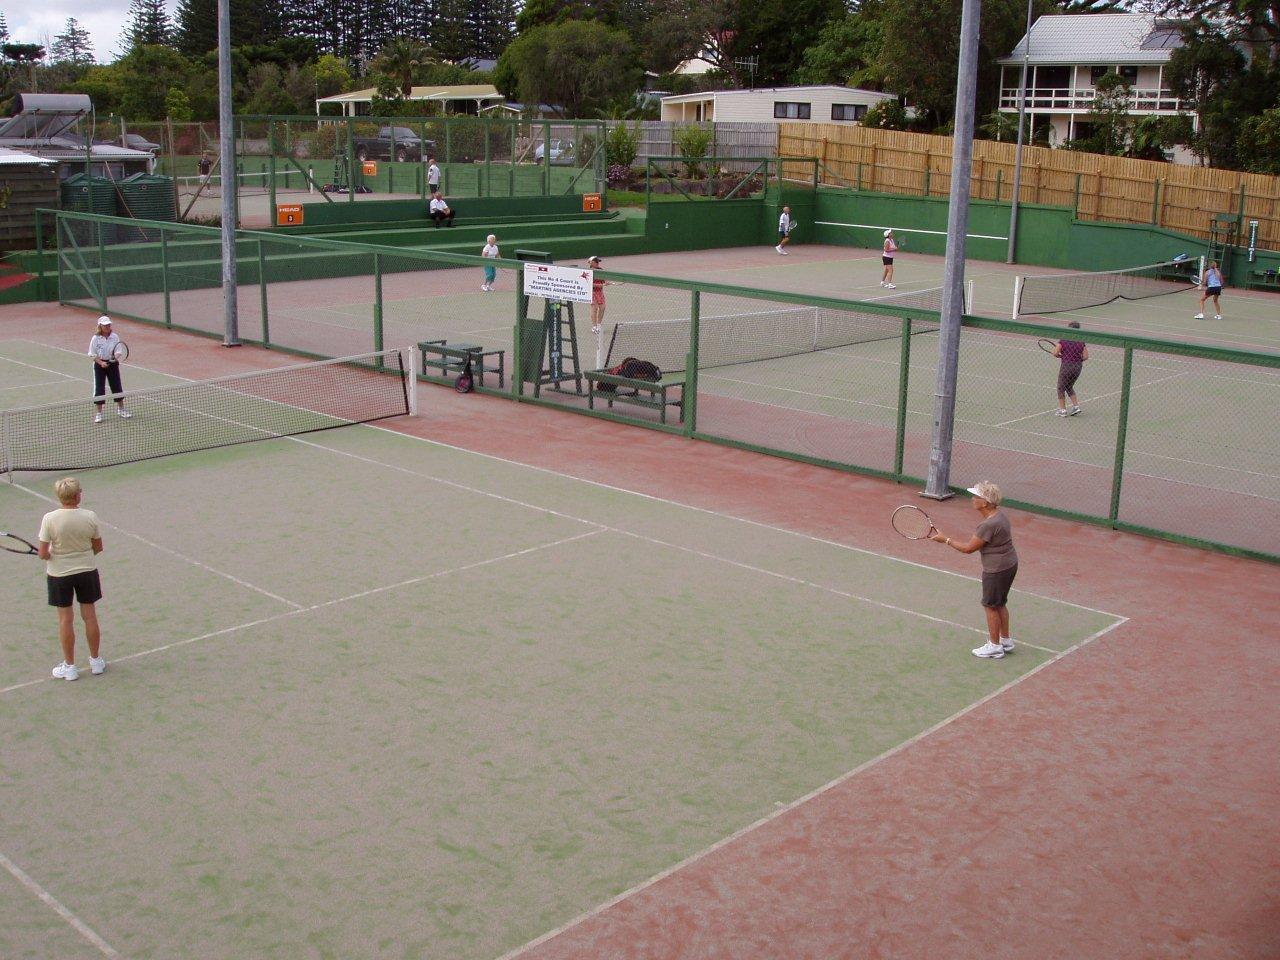 http://1.bp.blogspot.com/_DYHI9jCSTHA/TDKO7oHOM-I/AAAAAAAAACs/7Z8Gney4peA/s1600/Tennis+action+1.jpg